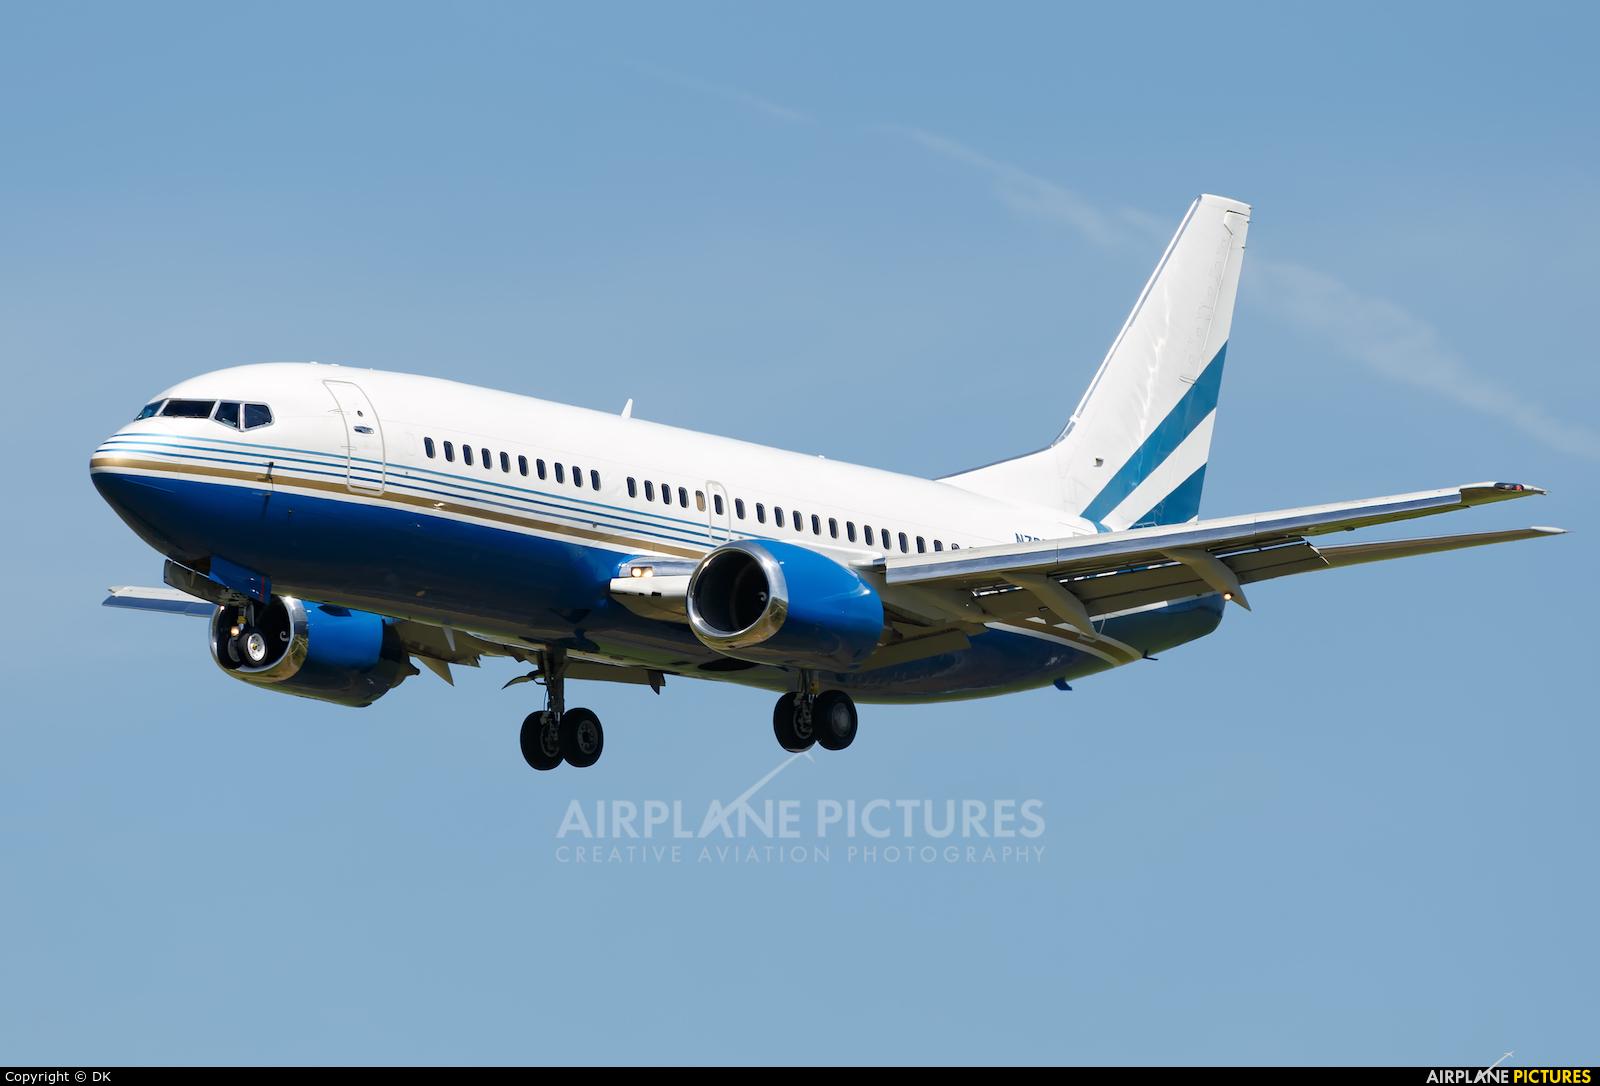 N789LS - Las Vegas Sands Boeing 737-300 at Berlin - Schönefeld | Photo ID  914465 | Airplane-Pictures.net